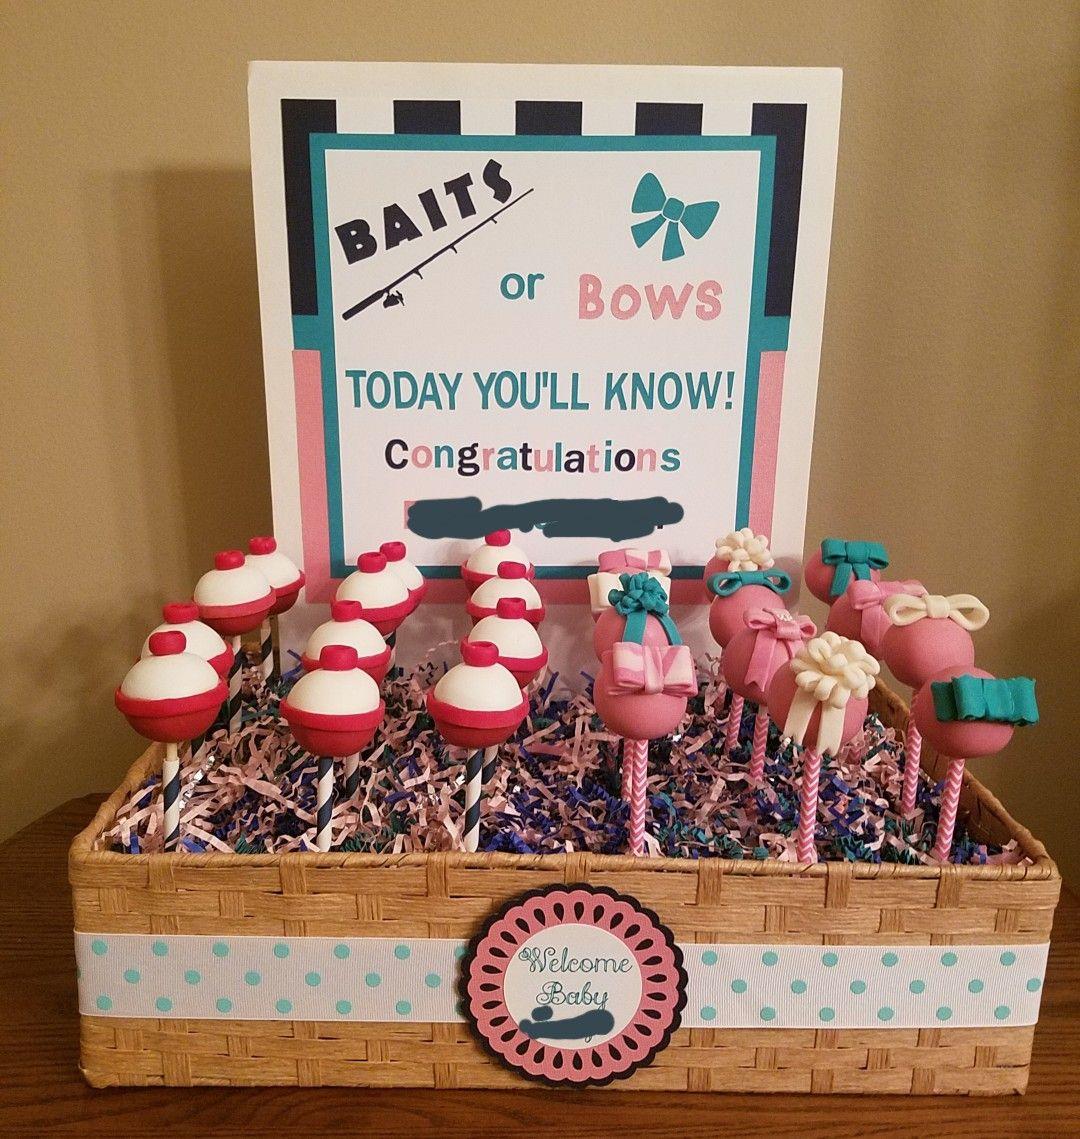 Baits bobbers or bows baby shower cake pops gender